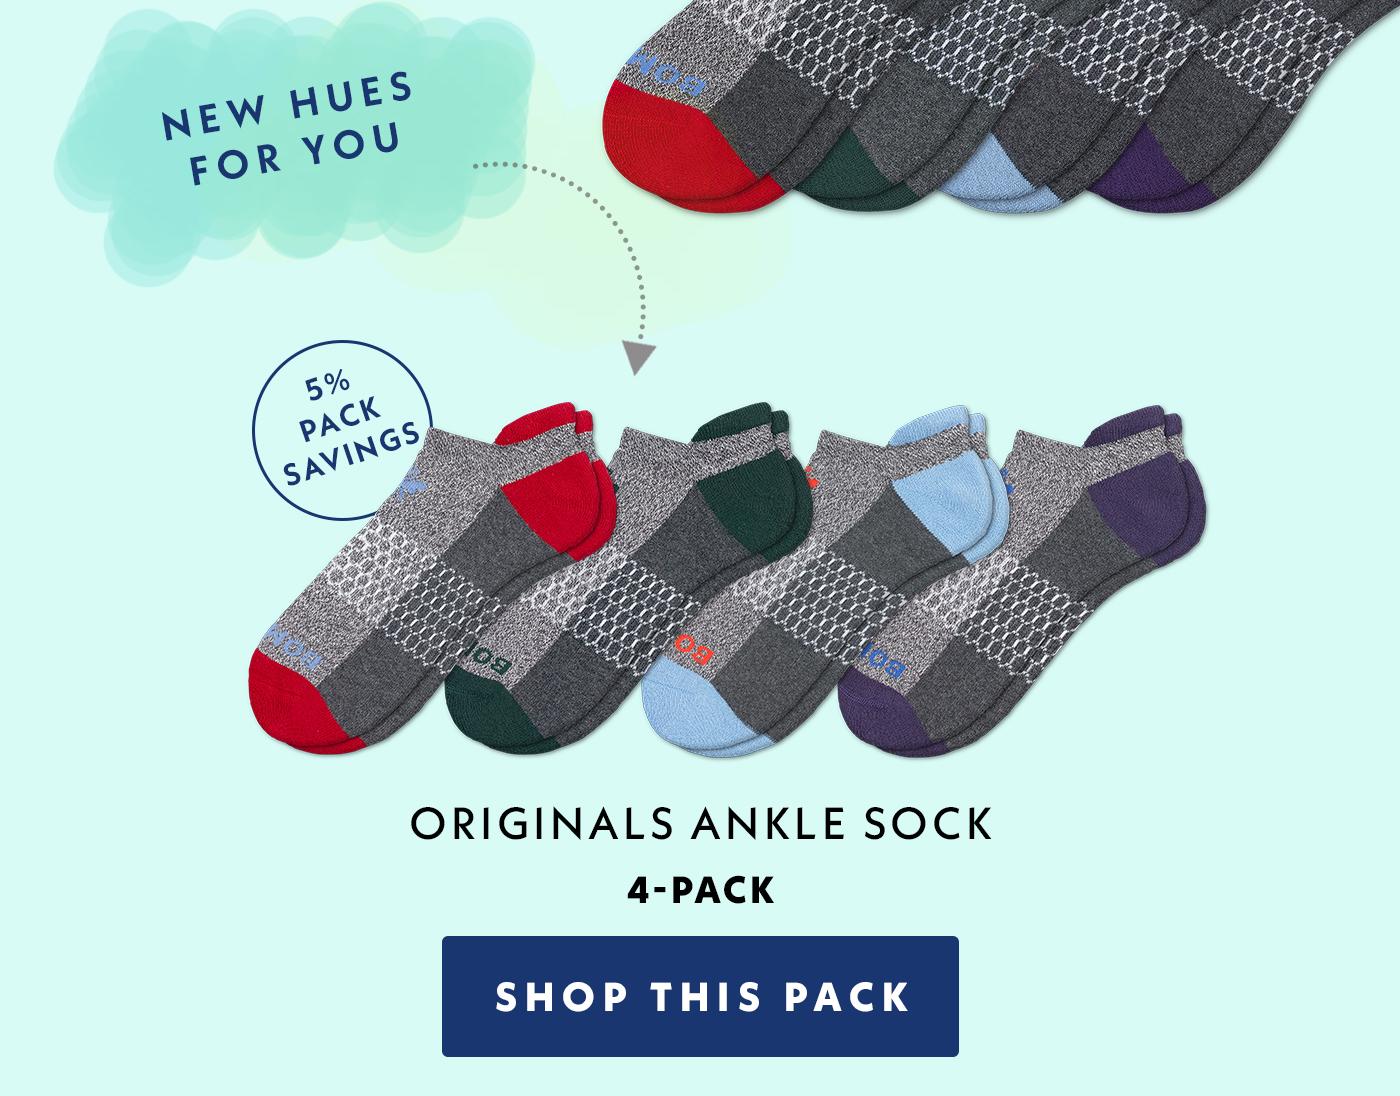 5% Pack Savings | Originals Ankle Sock | 4-Pack | Shop This Pack